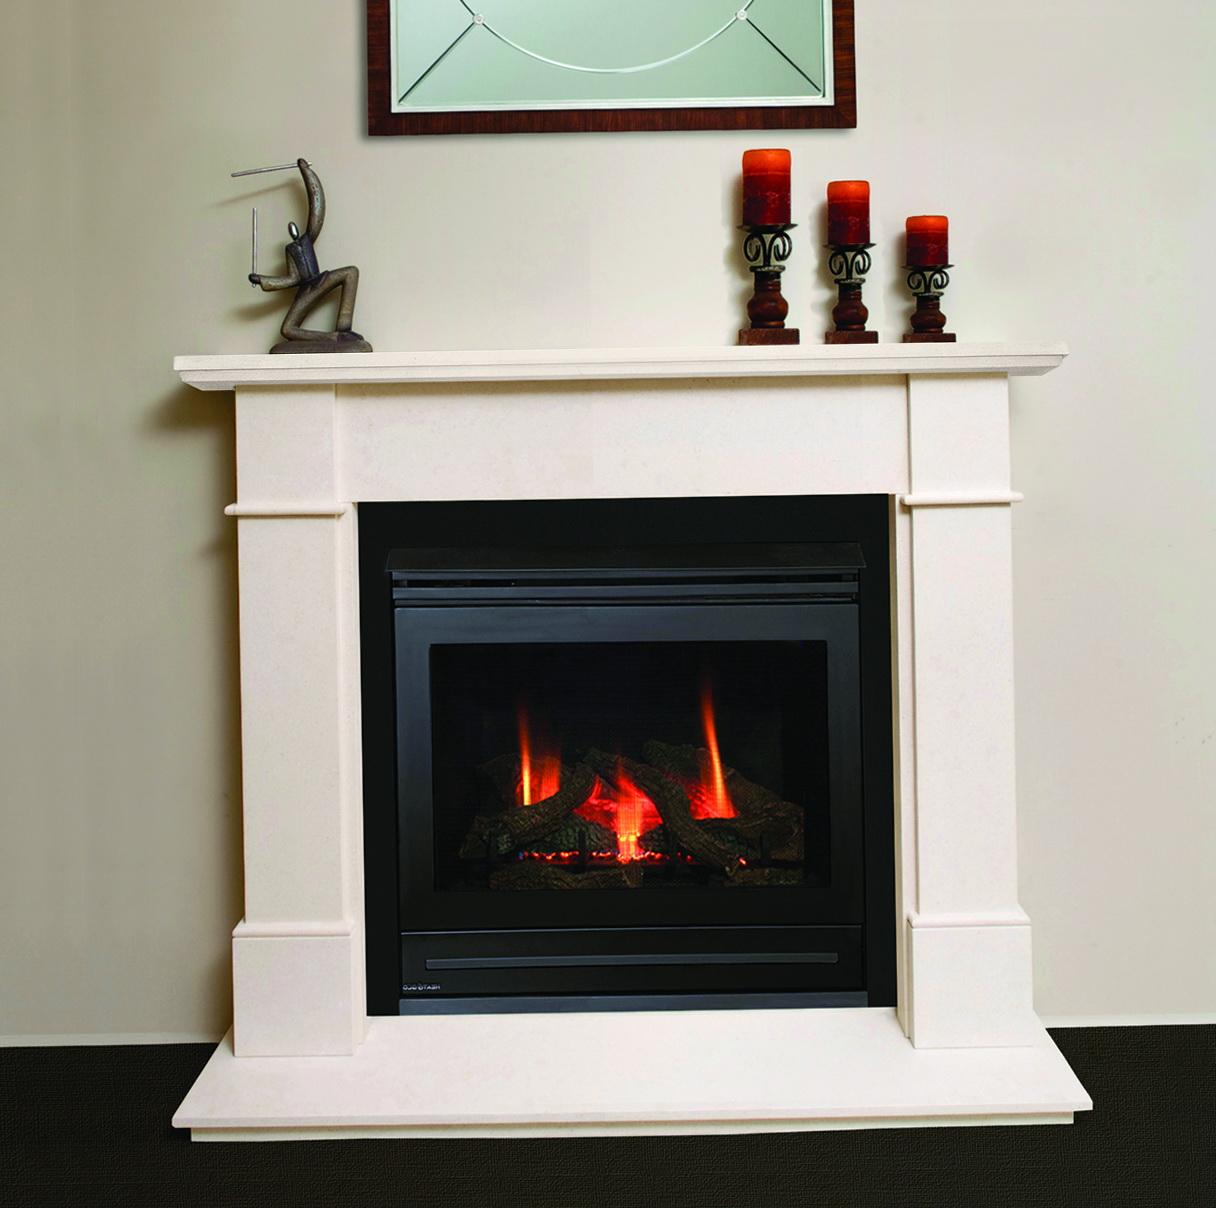 100 Electric Fireplace Stoves Charmglow Electric Fireplace Pureflame Orinda Wall Mount Bio